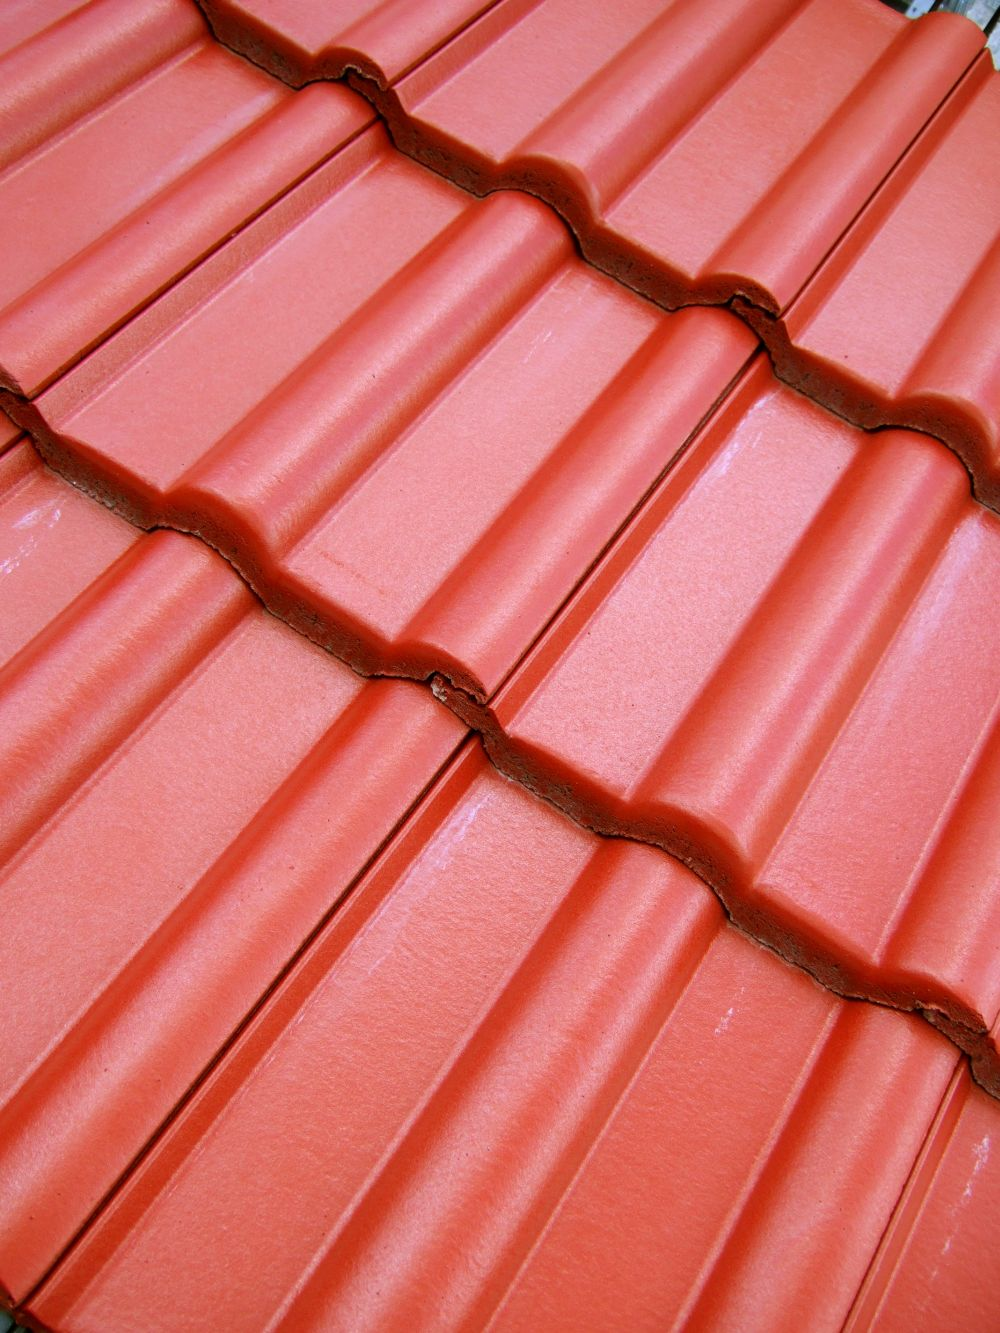 dachziegel engobiert blickfang auf jedem dach. Black Bedroom Furniture Sets. Home Design Ideas